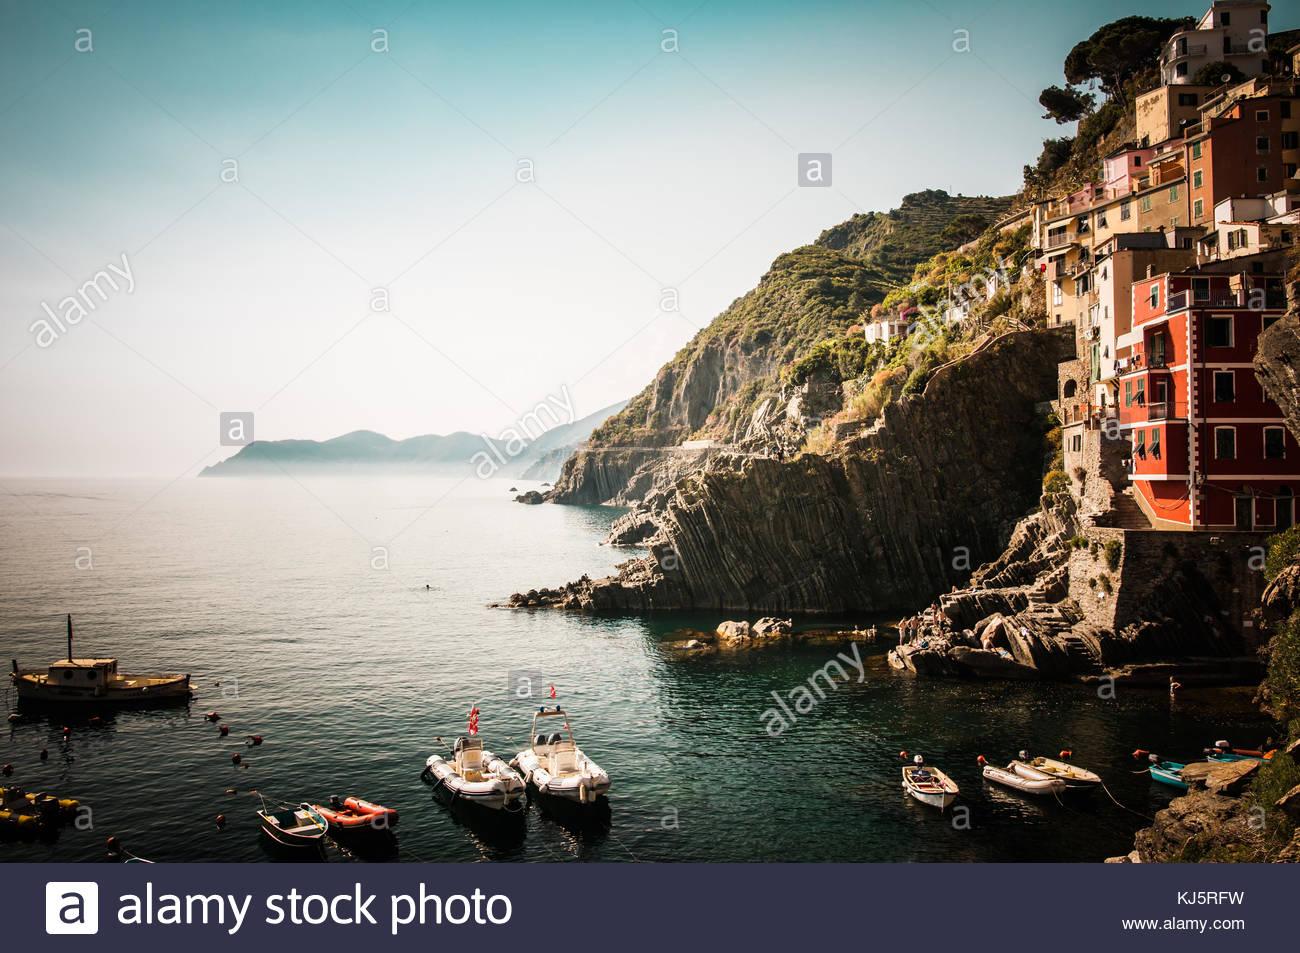 Cinque Terre, Italy - Stock Image